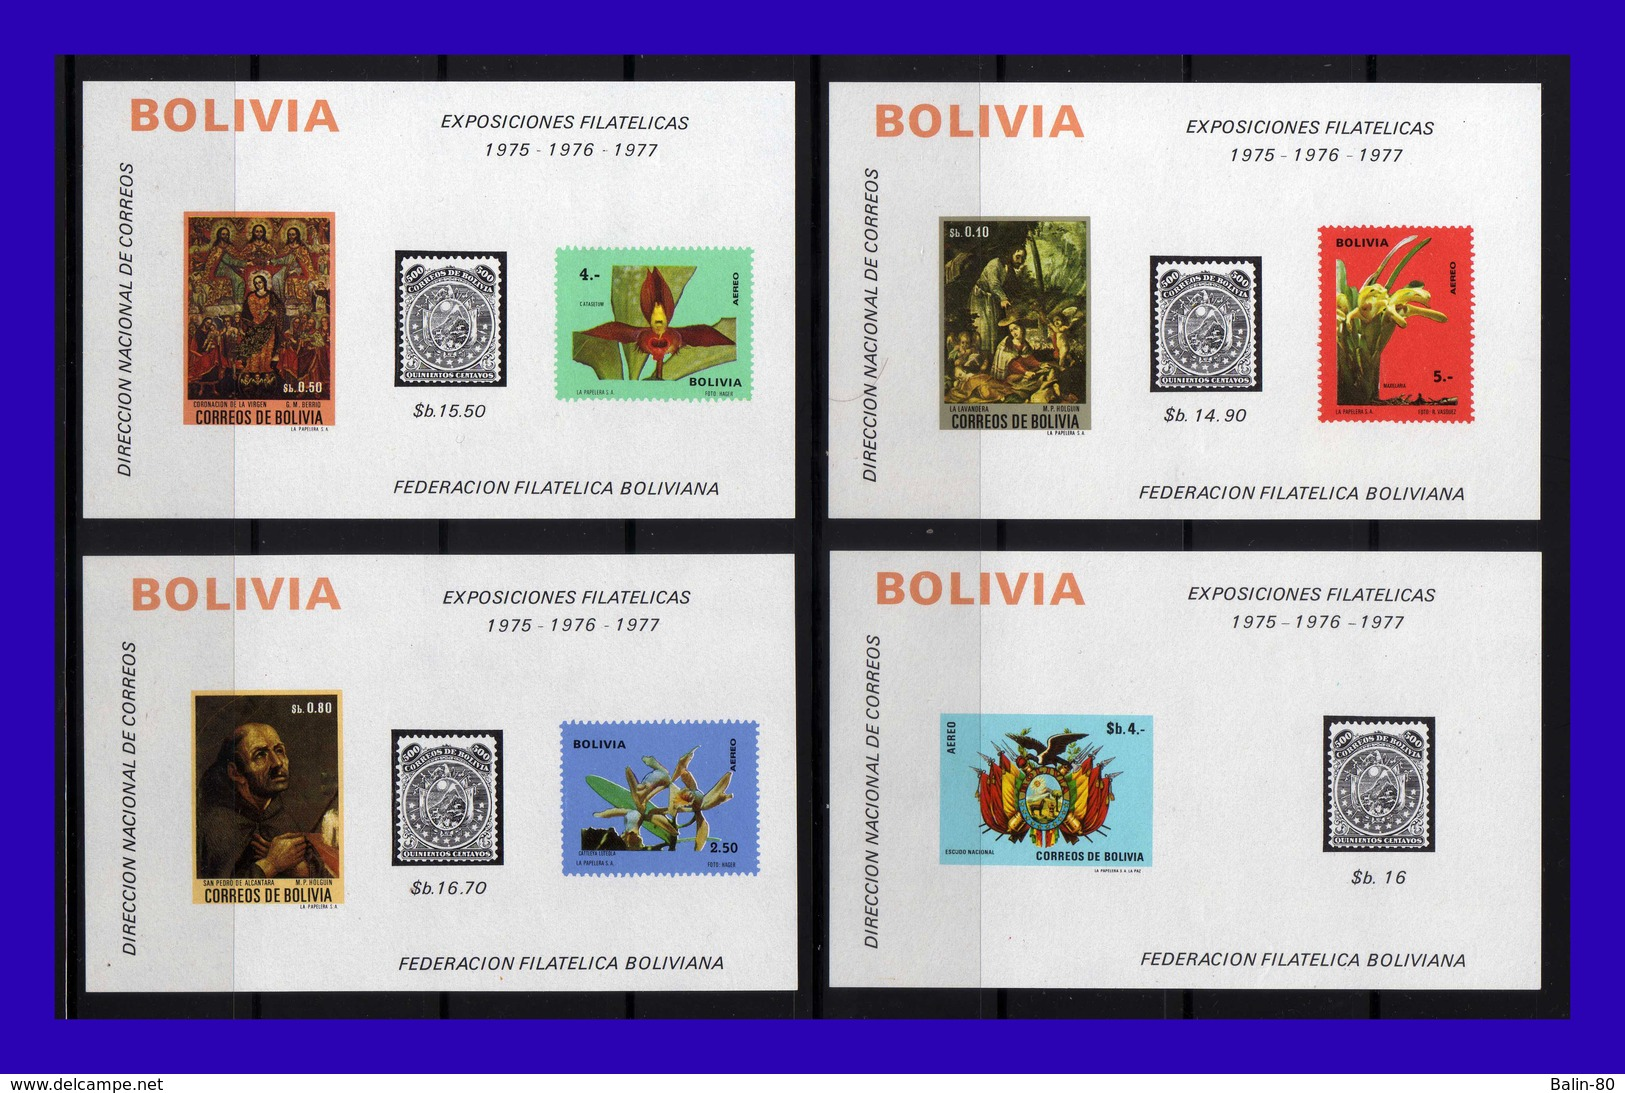 1974 - Bolivia - Yvert H 26 - 29 - MNH - BO-102 - 03 - Bolivia